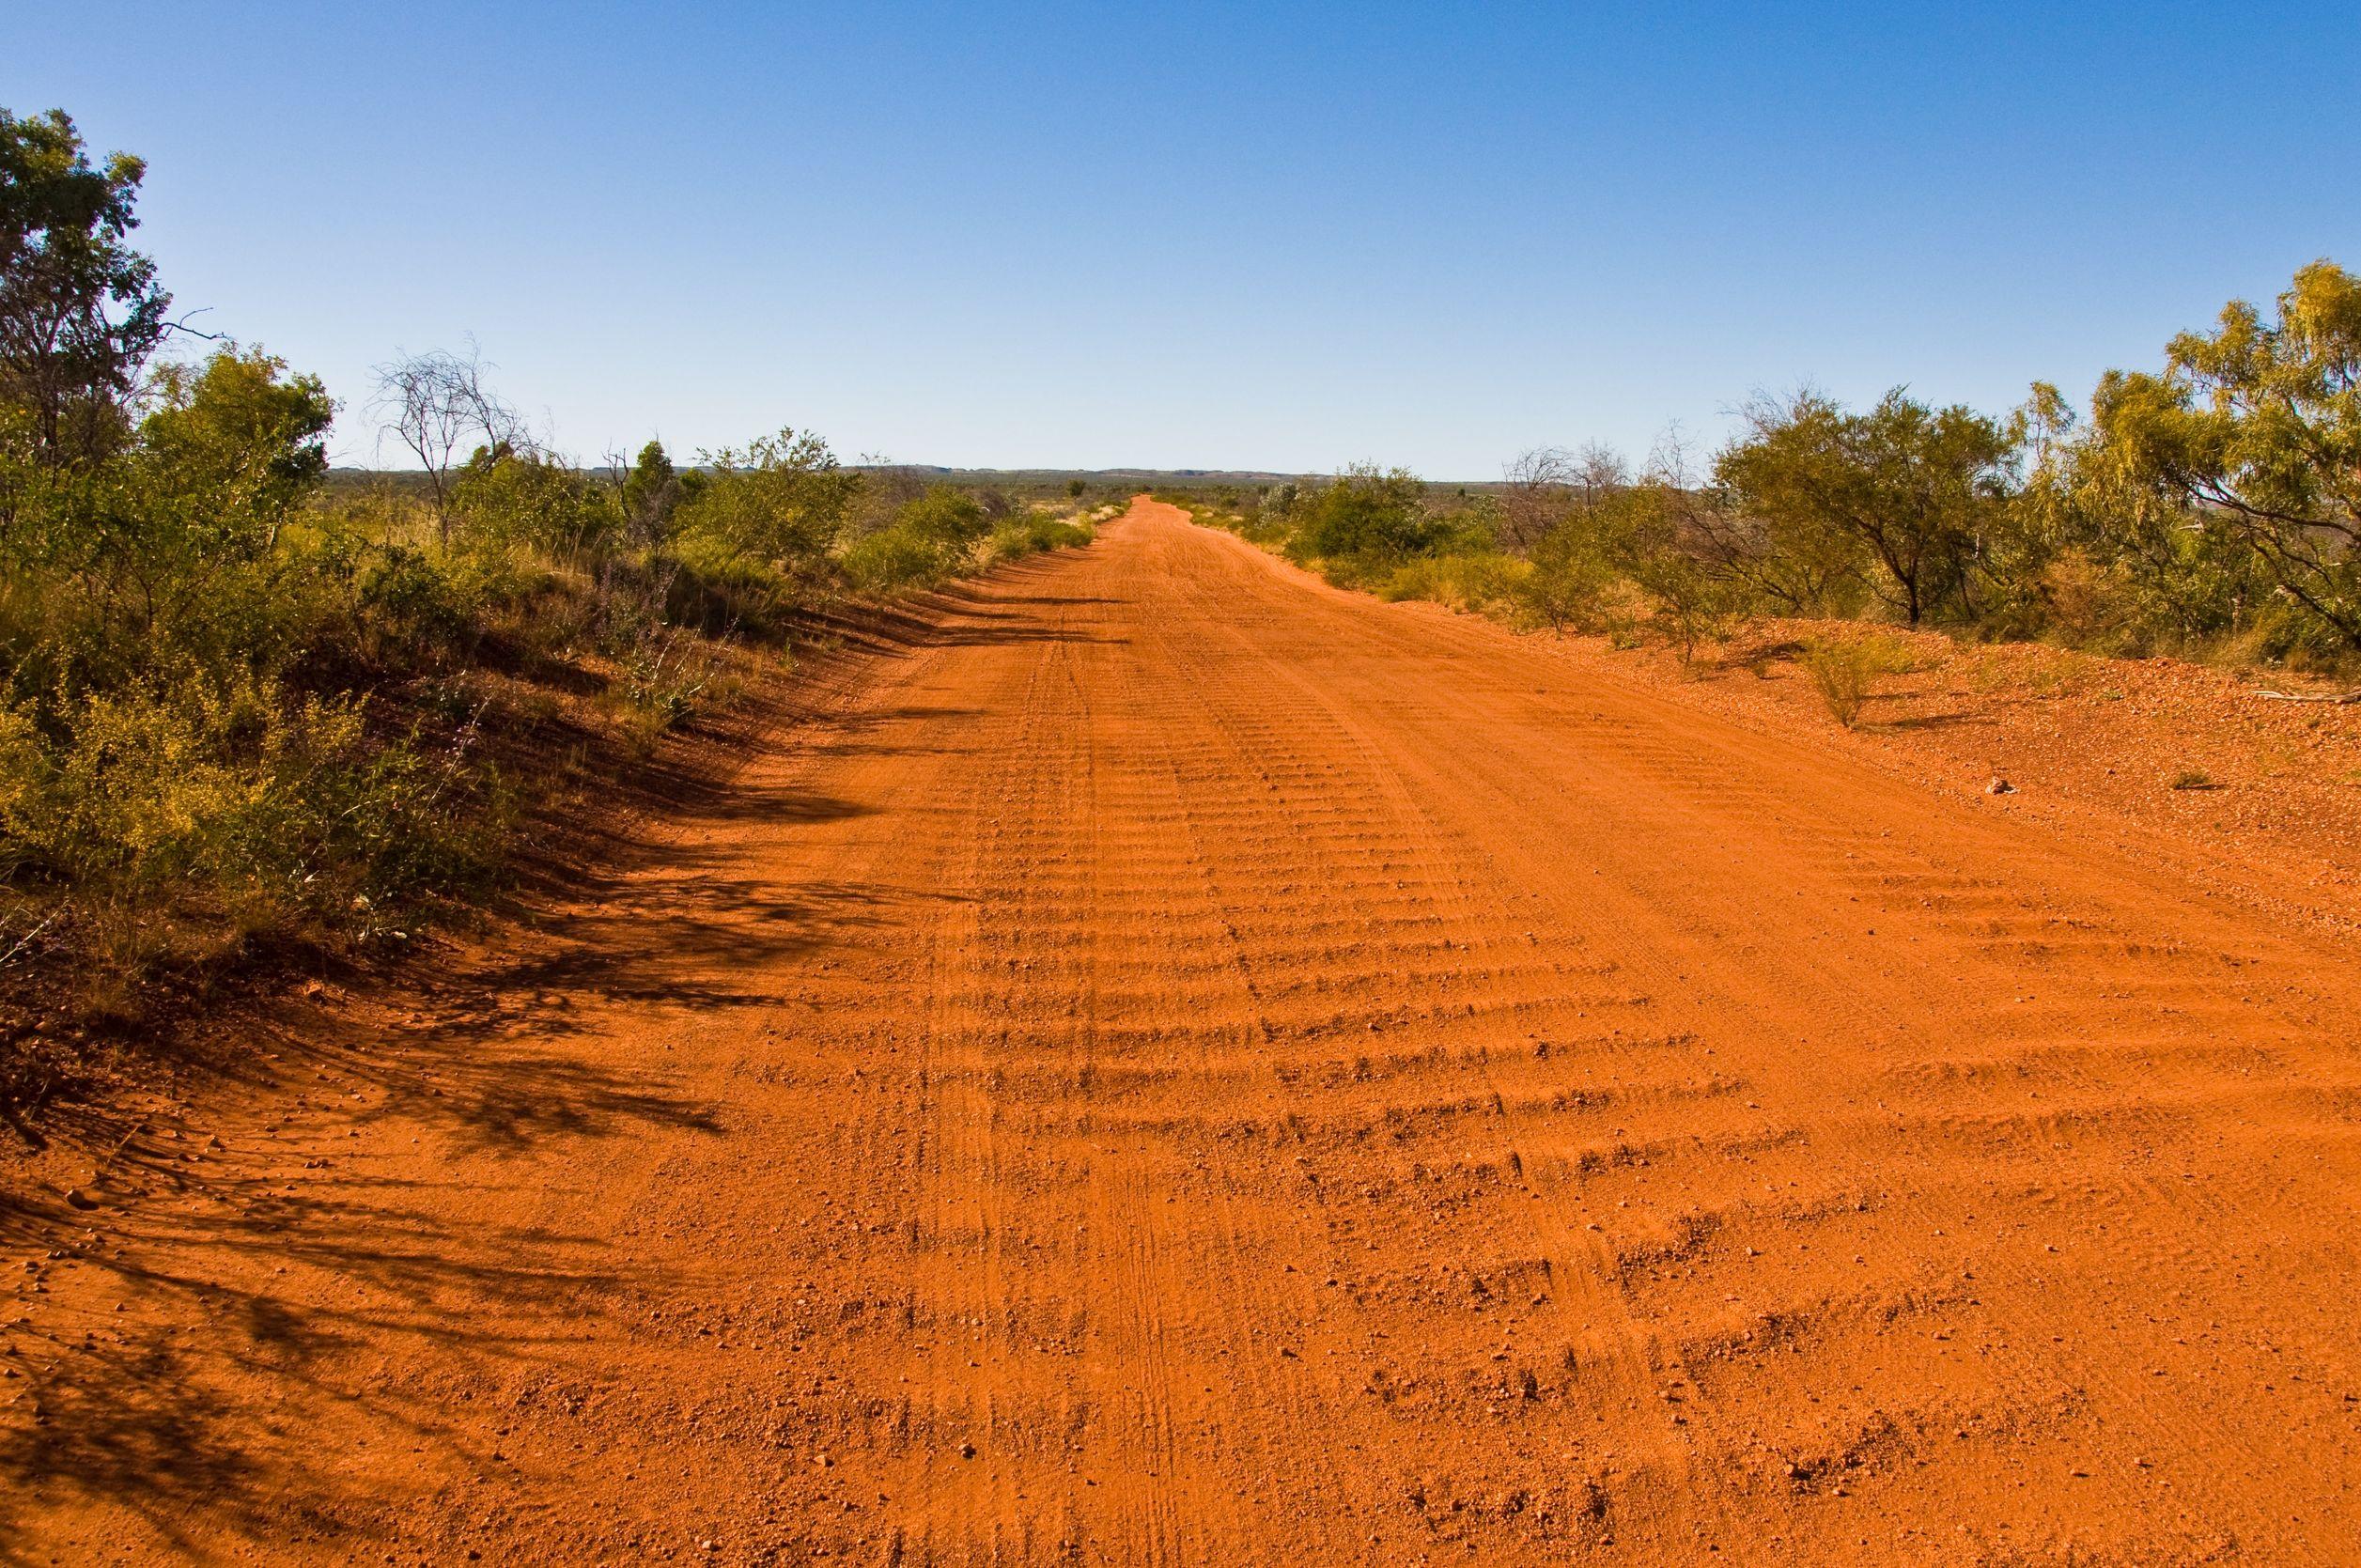 australia backroad outback 123rf